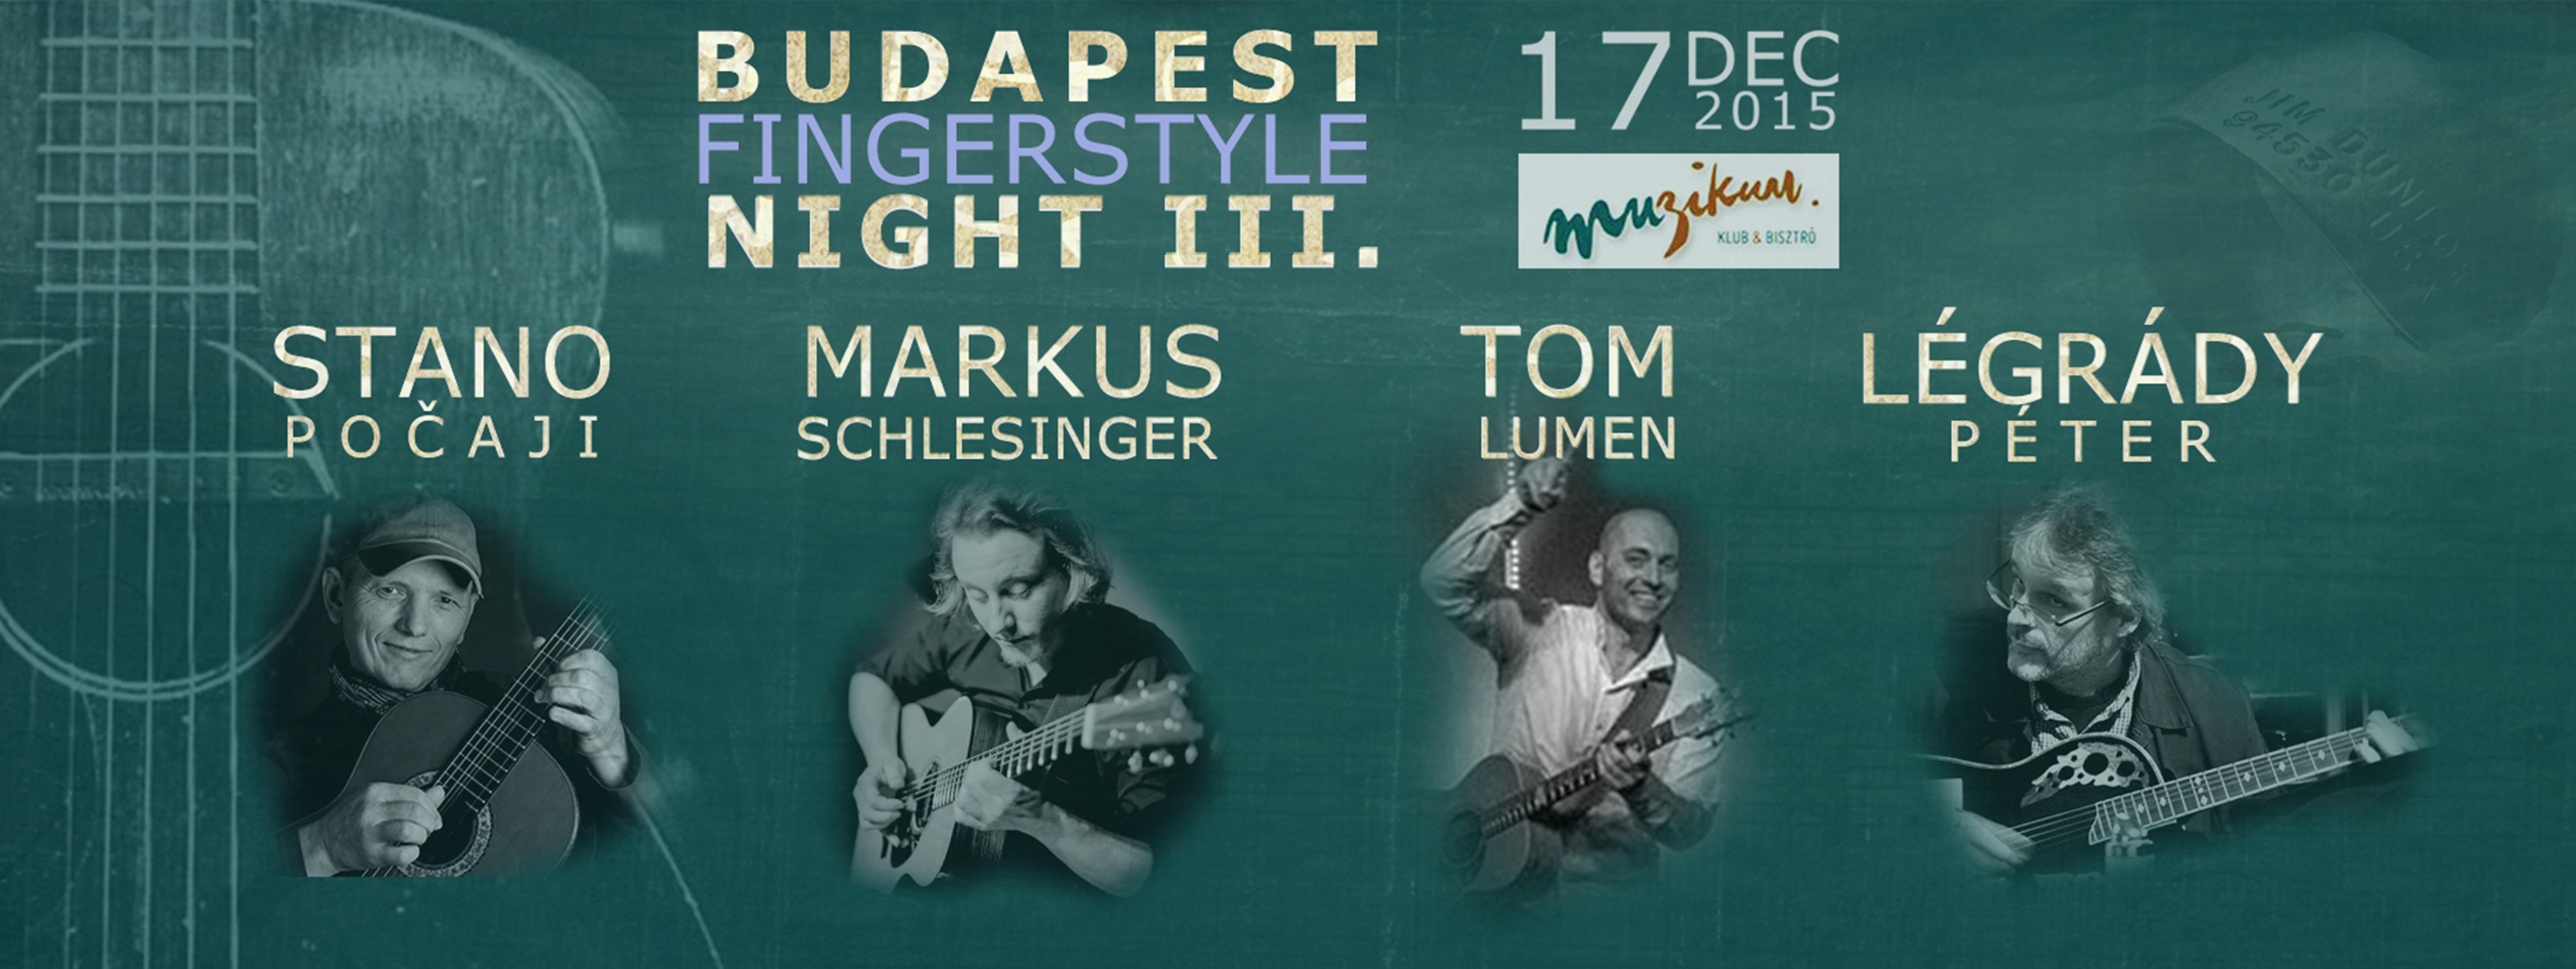 Budapest Fingerstyle Night III